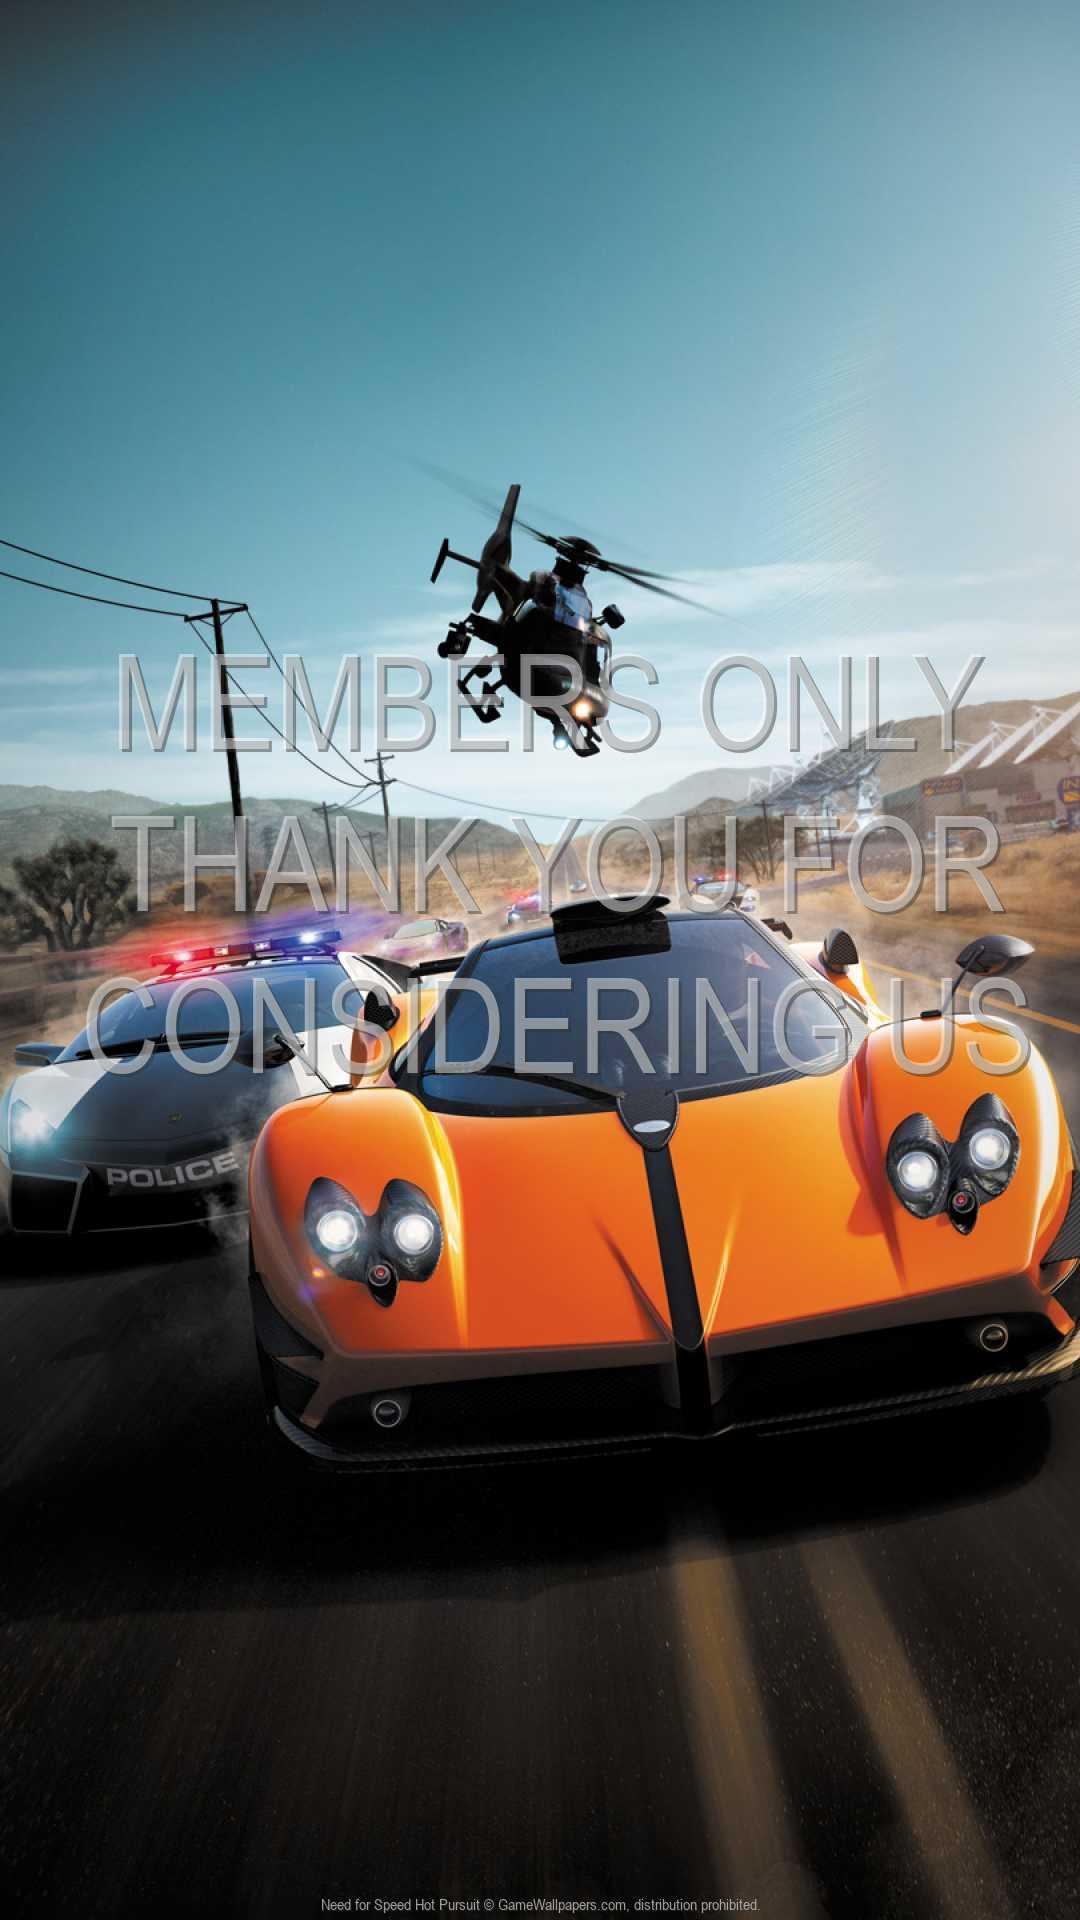 Need for Speed: Hot Pursuit 1080p Vertical Handy Hintergrundbild 04